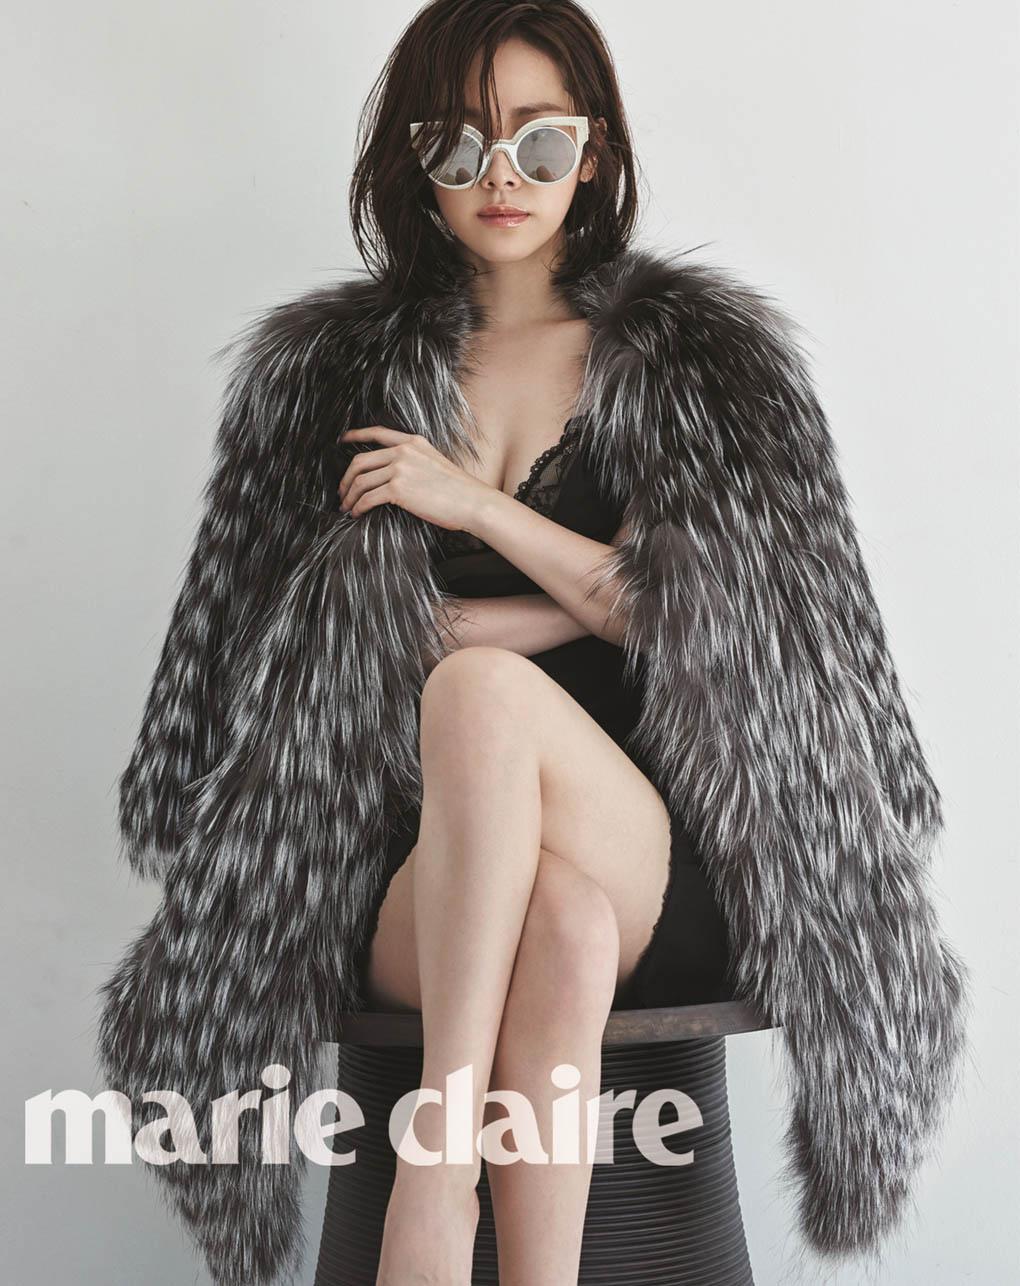 韓志旼_marie claire_201511_1